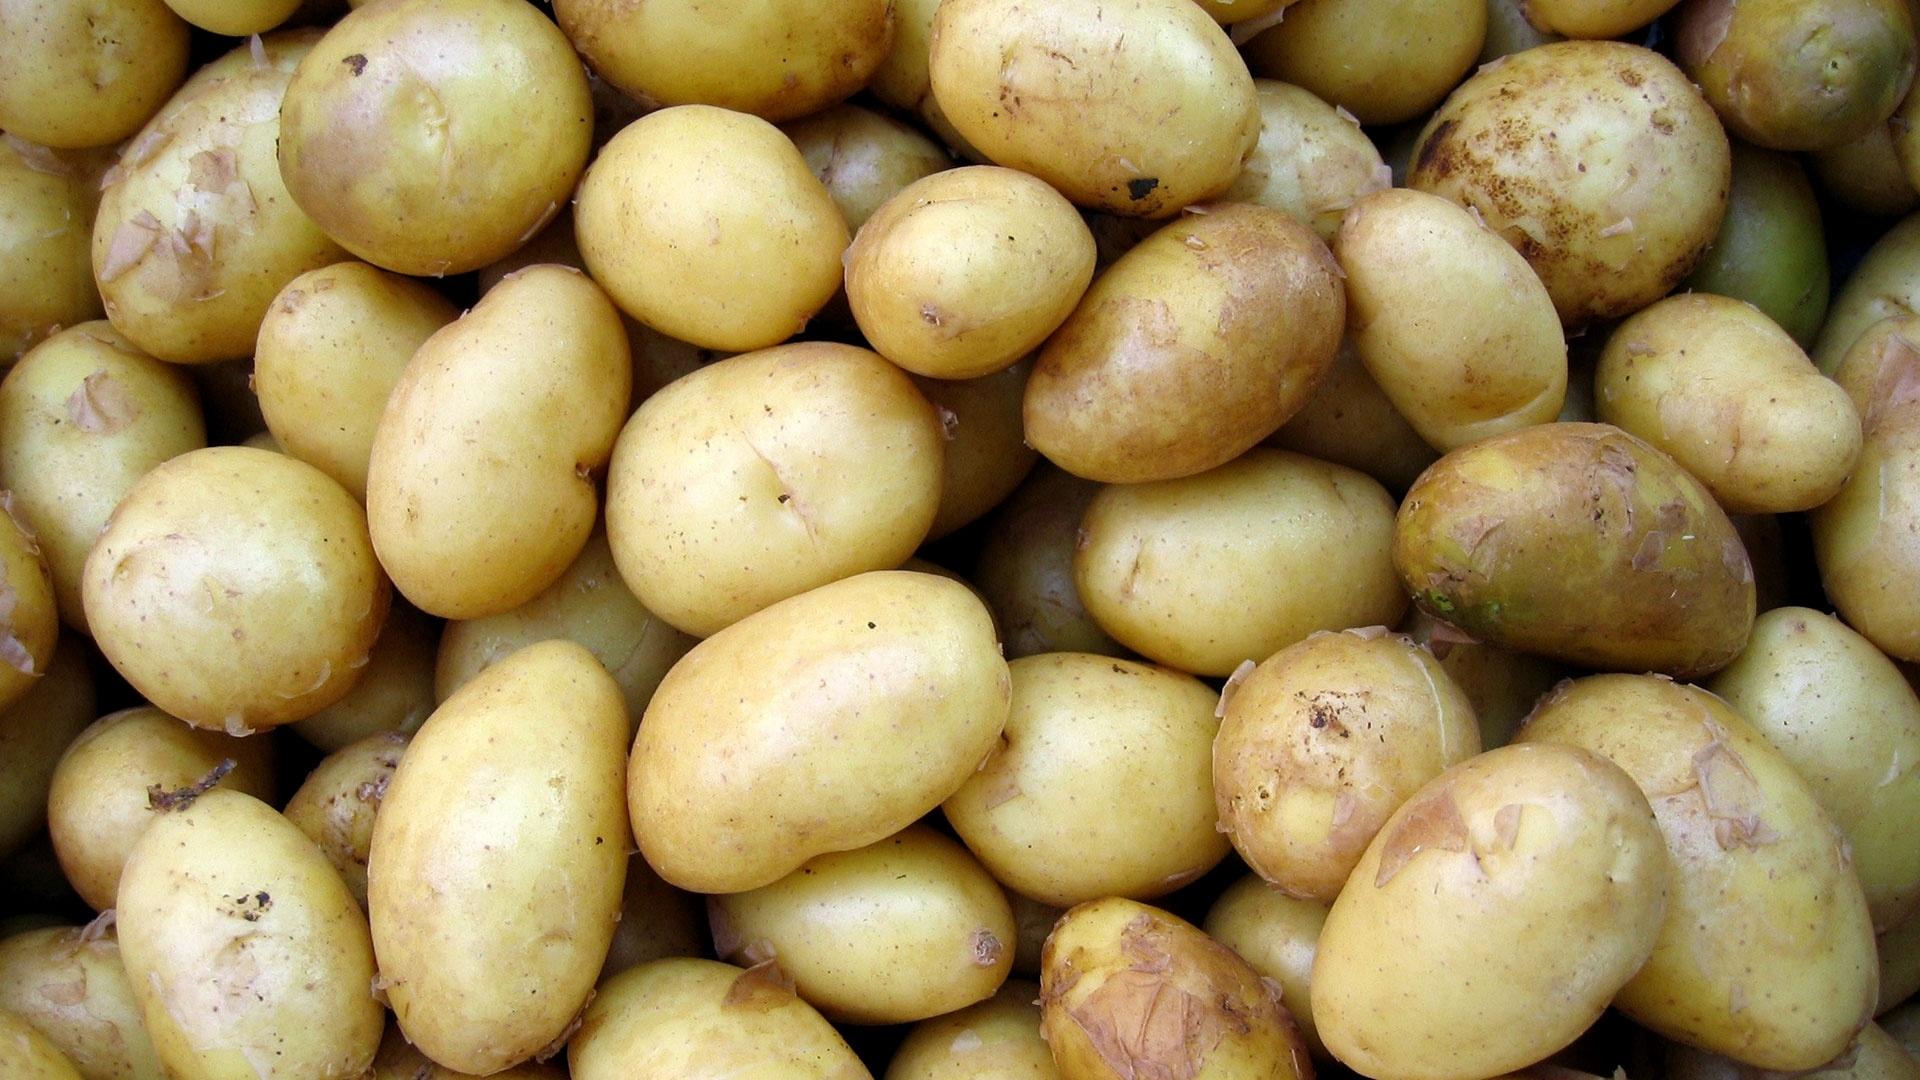 Potatoes Desktop Wallpaper